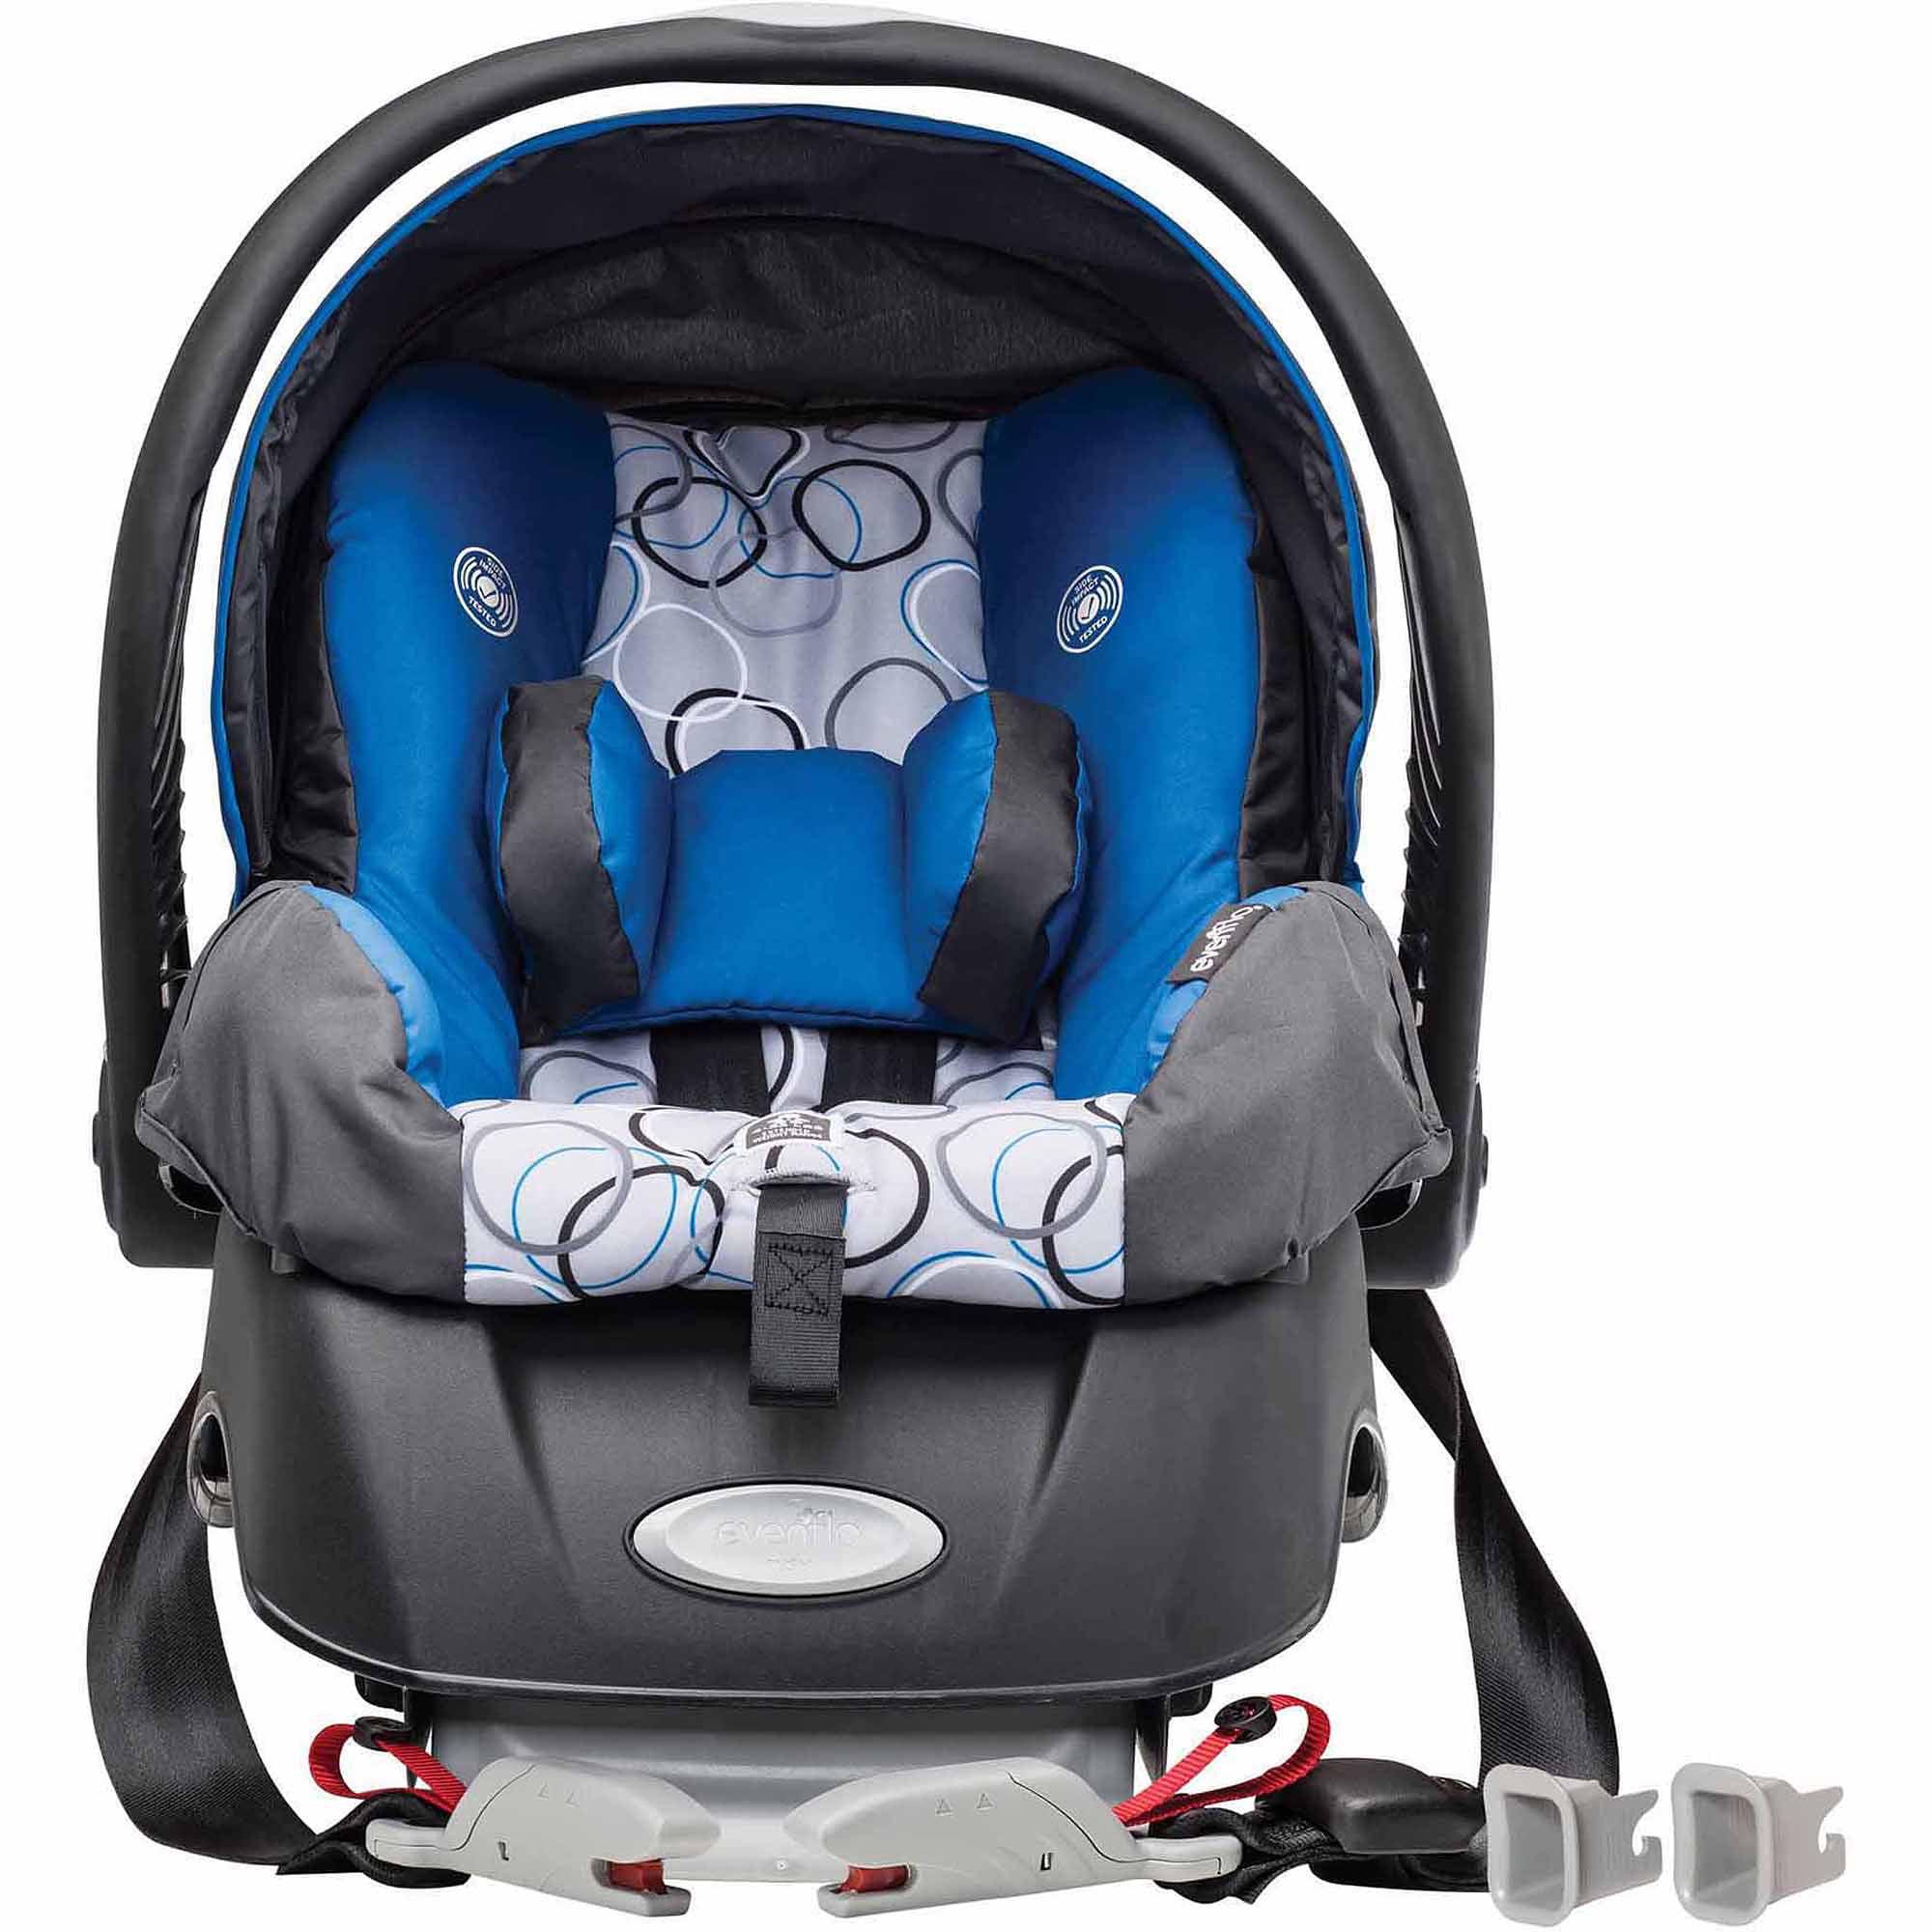 Evenflo Embrace Select Infant Car Seat with Sure Safe Installation, Ashton